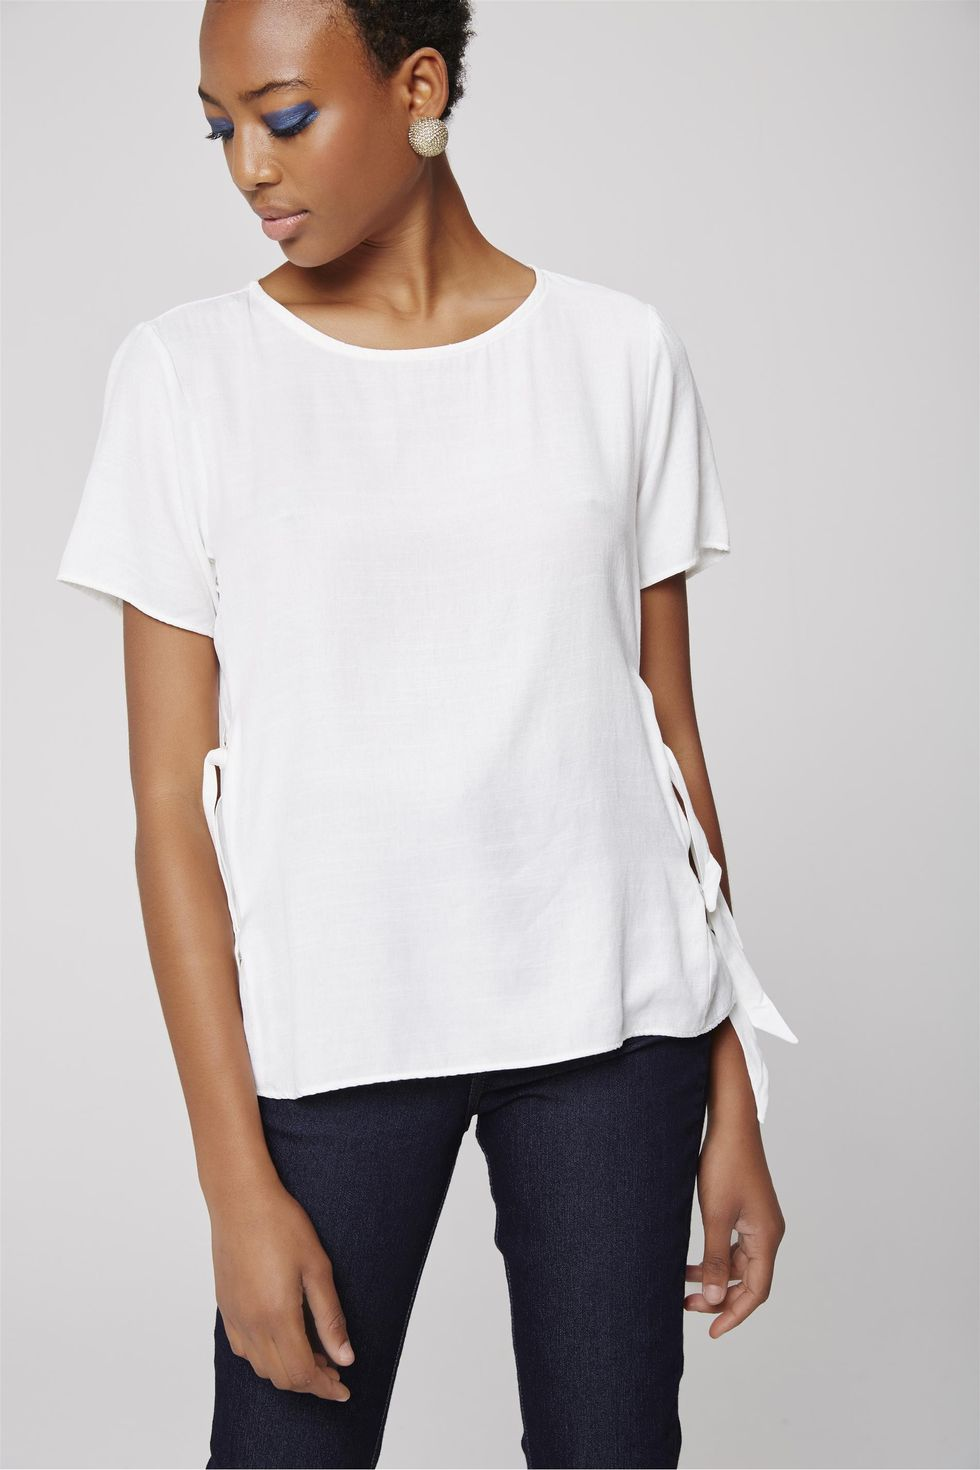 Blusa-Detalhe-Lateral-Feminina-Frente--